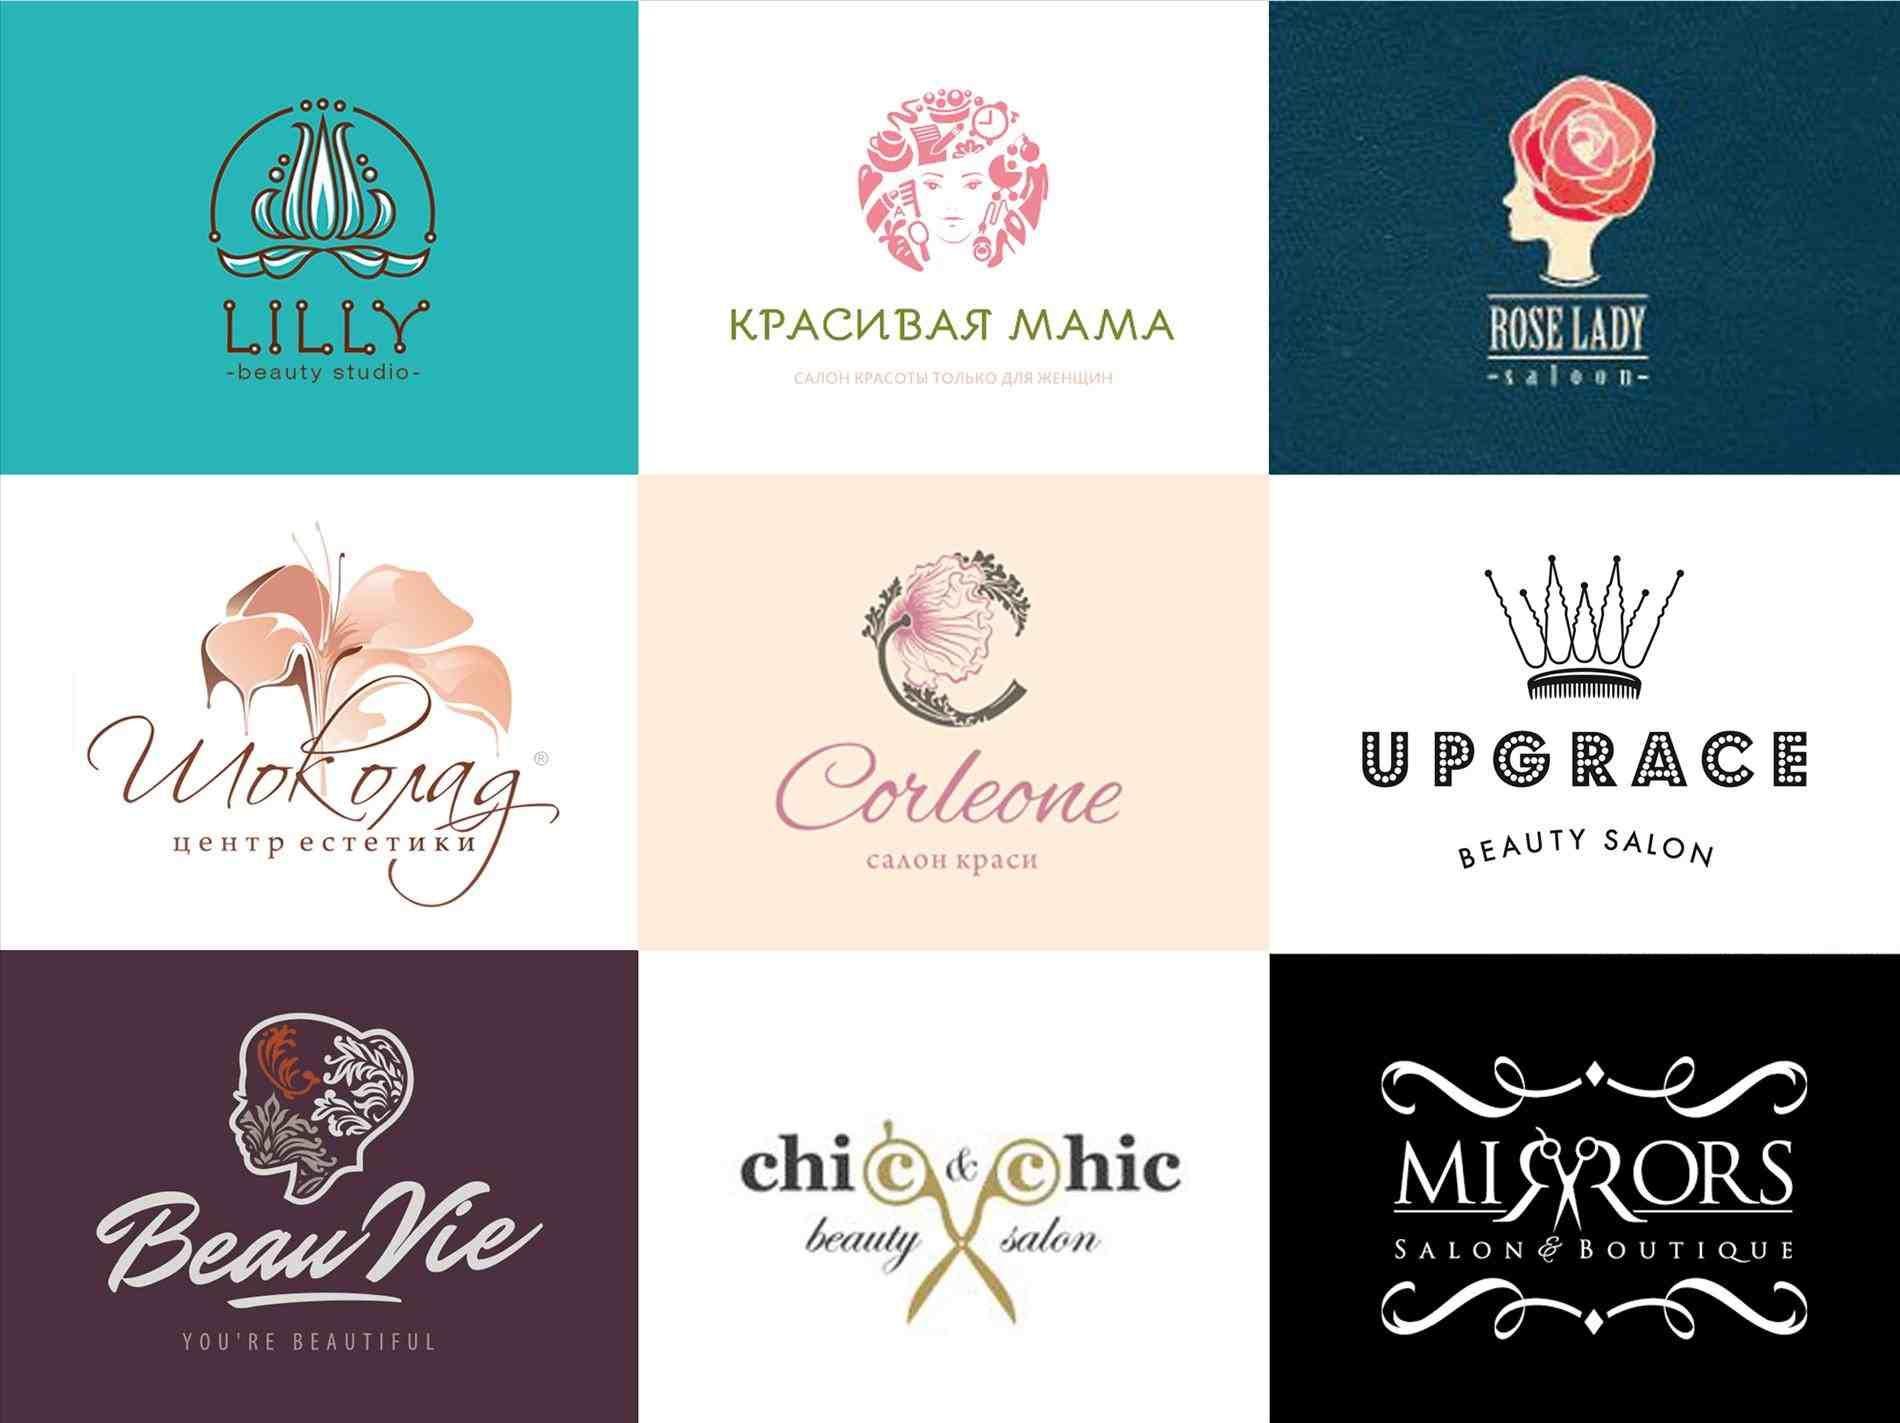 unique beauty salon name ideas | hair stylist and models